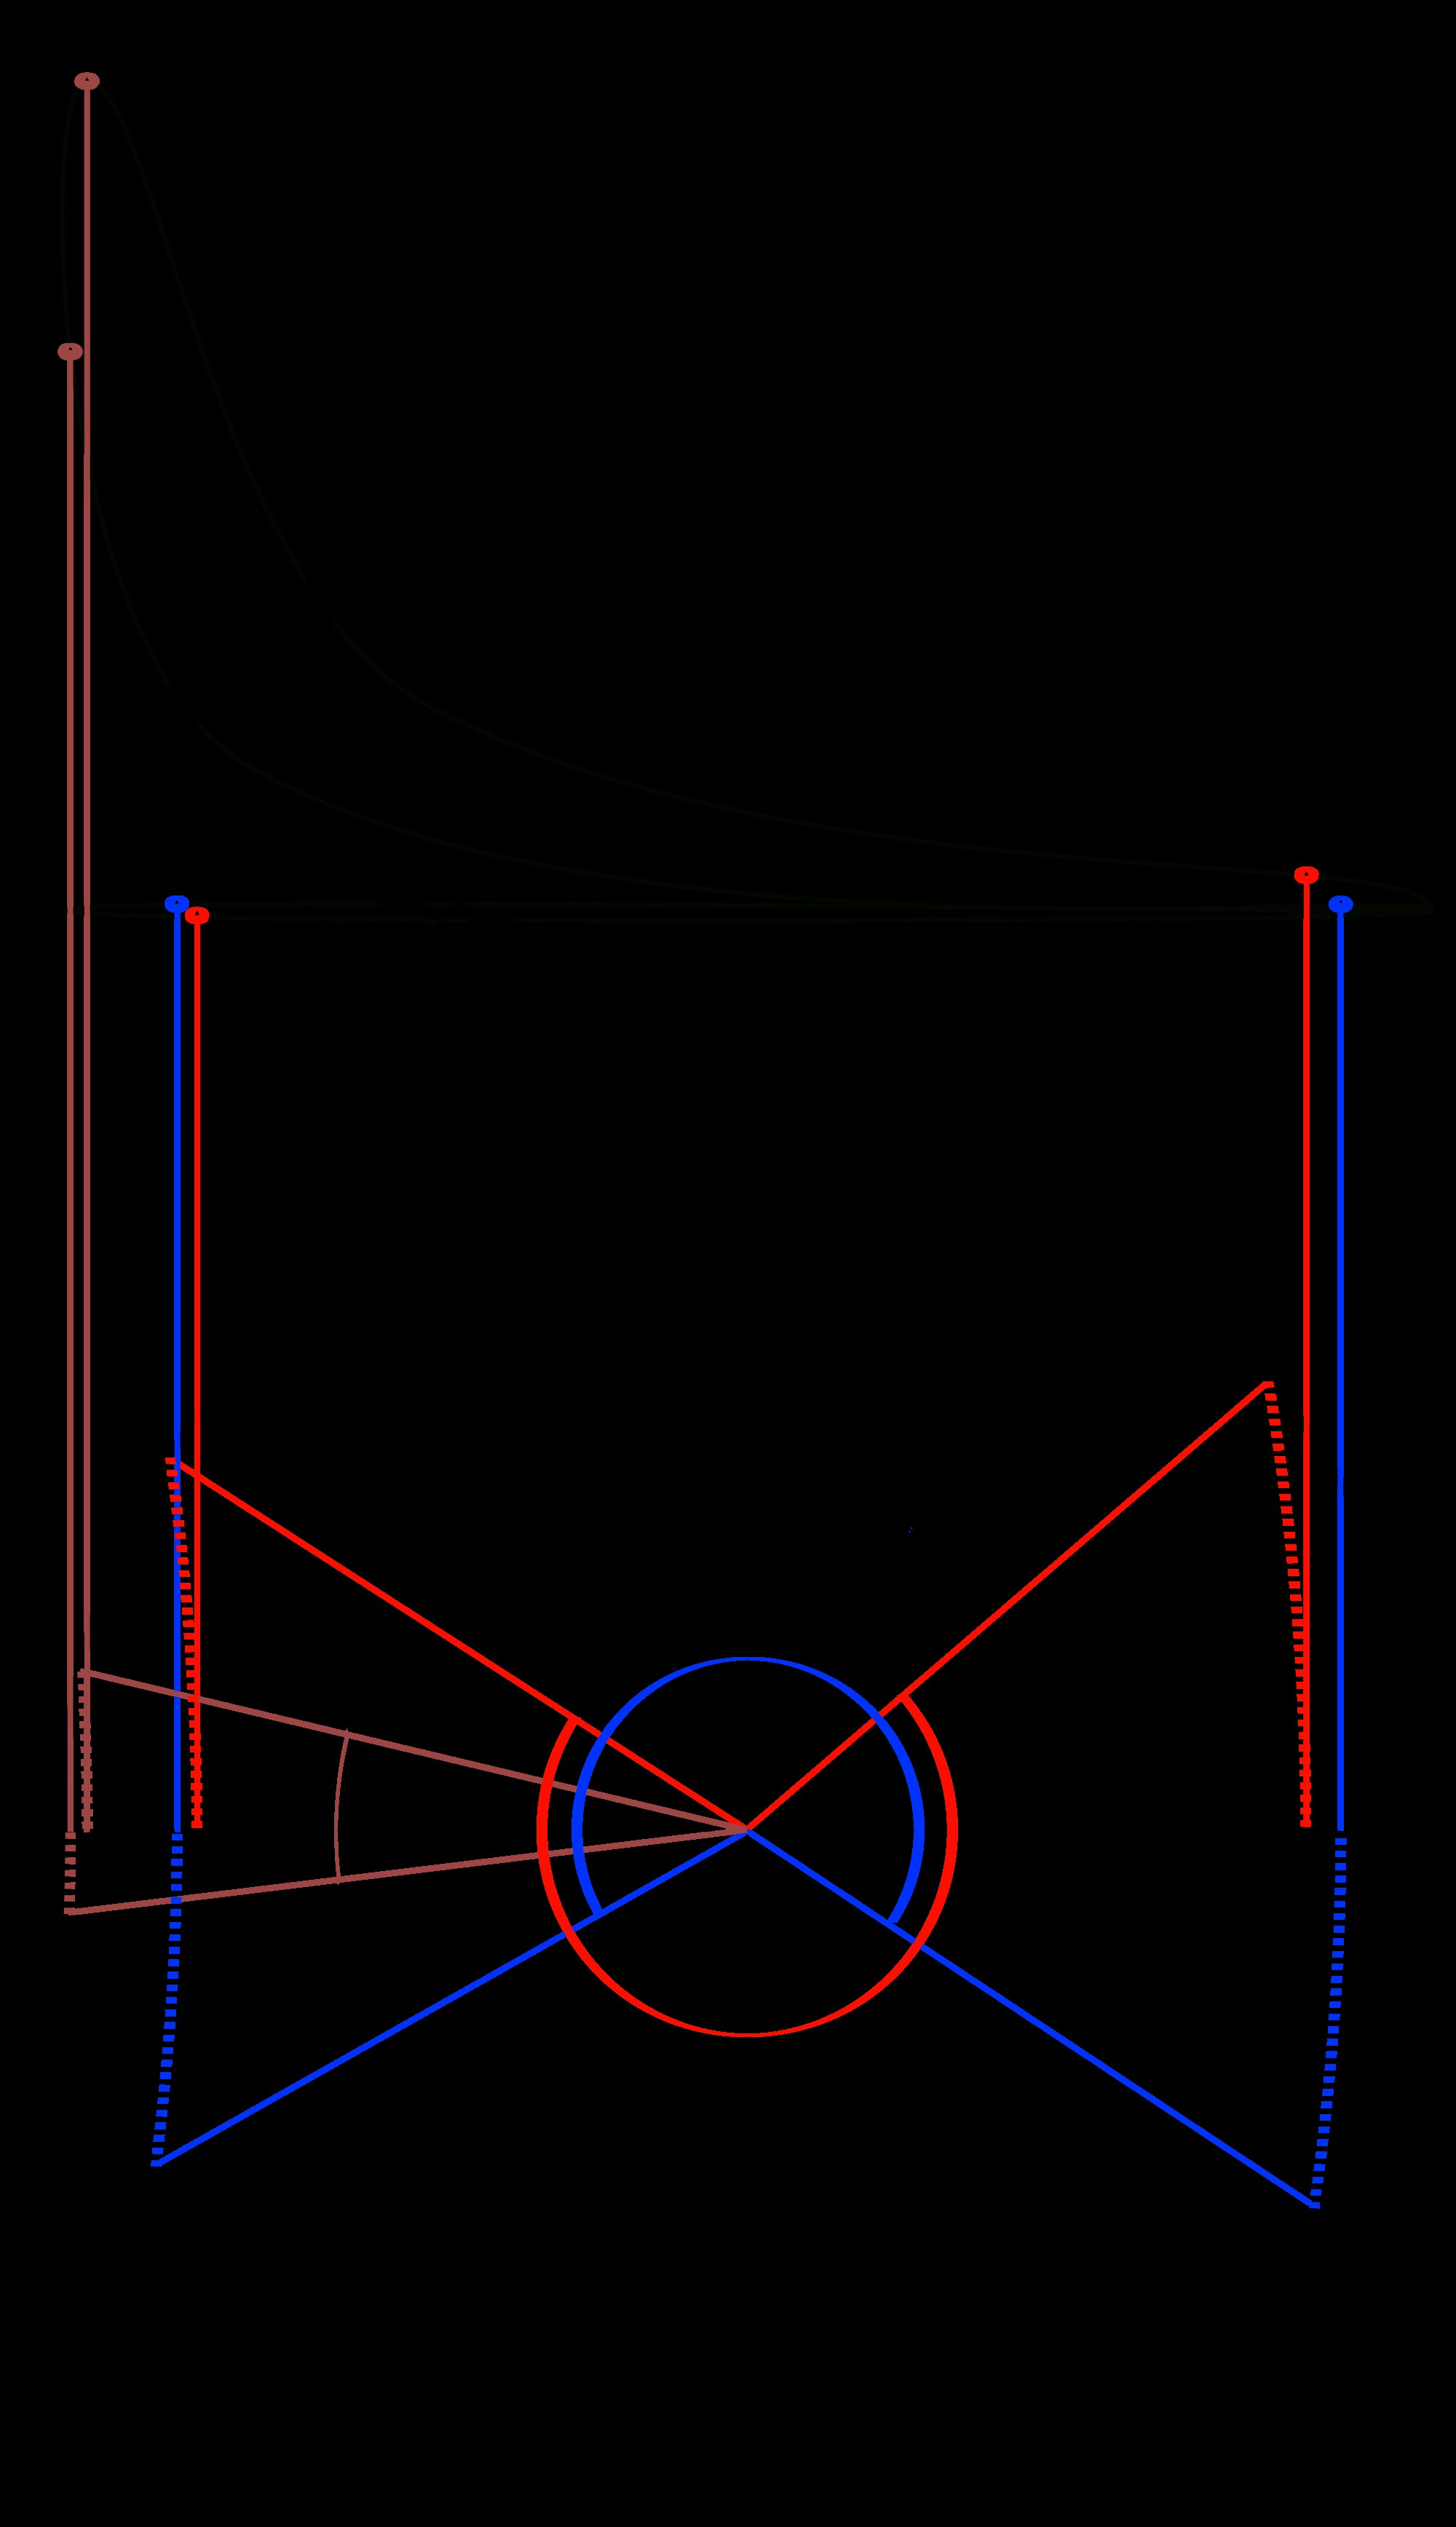 Engine Indicator Diagram File Indicator Diagram Four Stroke Selg Wikimedia Mons Of Engine Indicator Diagram